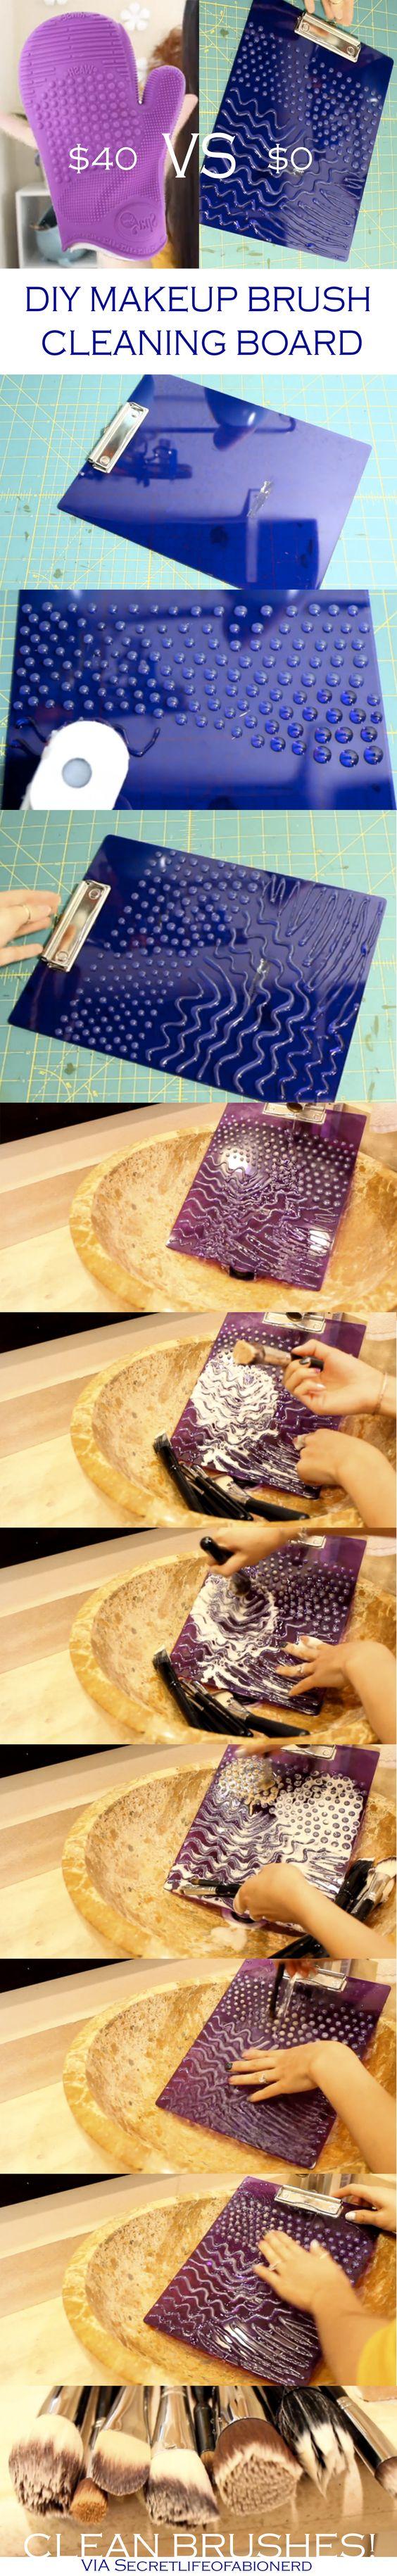 DIY Makeup Brush Cleaning Board - Via SecretLifeOfaBioNerd http://www.youtube.com/watch?v=Zeefo2wZ14k: